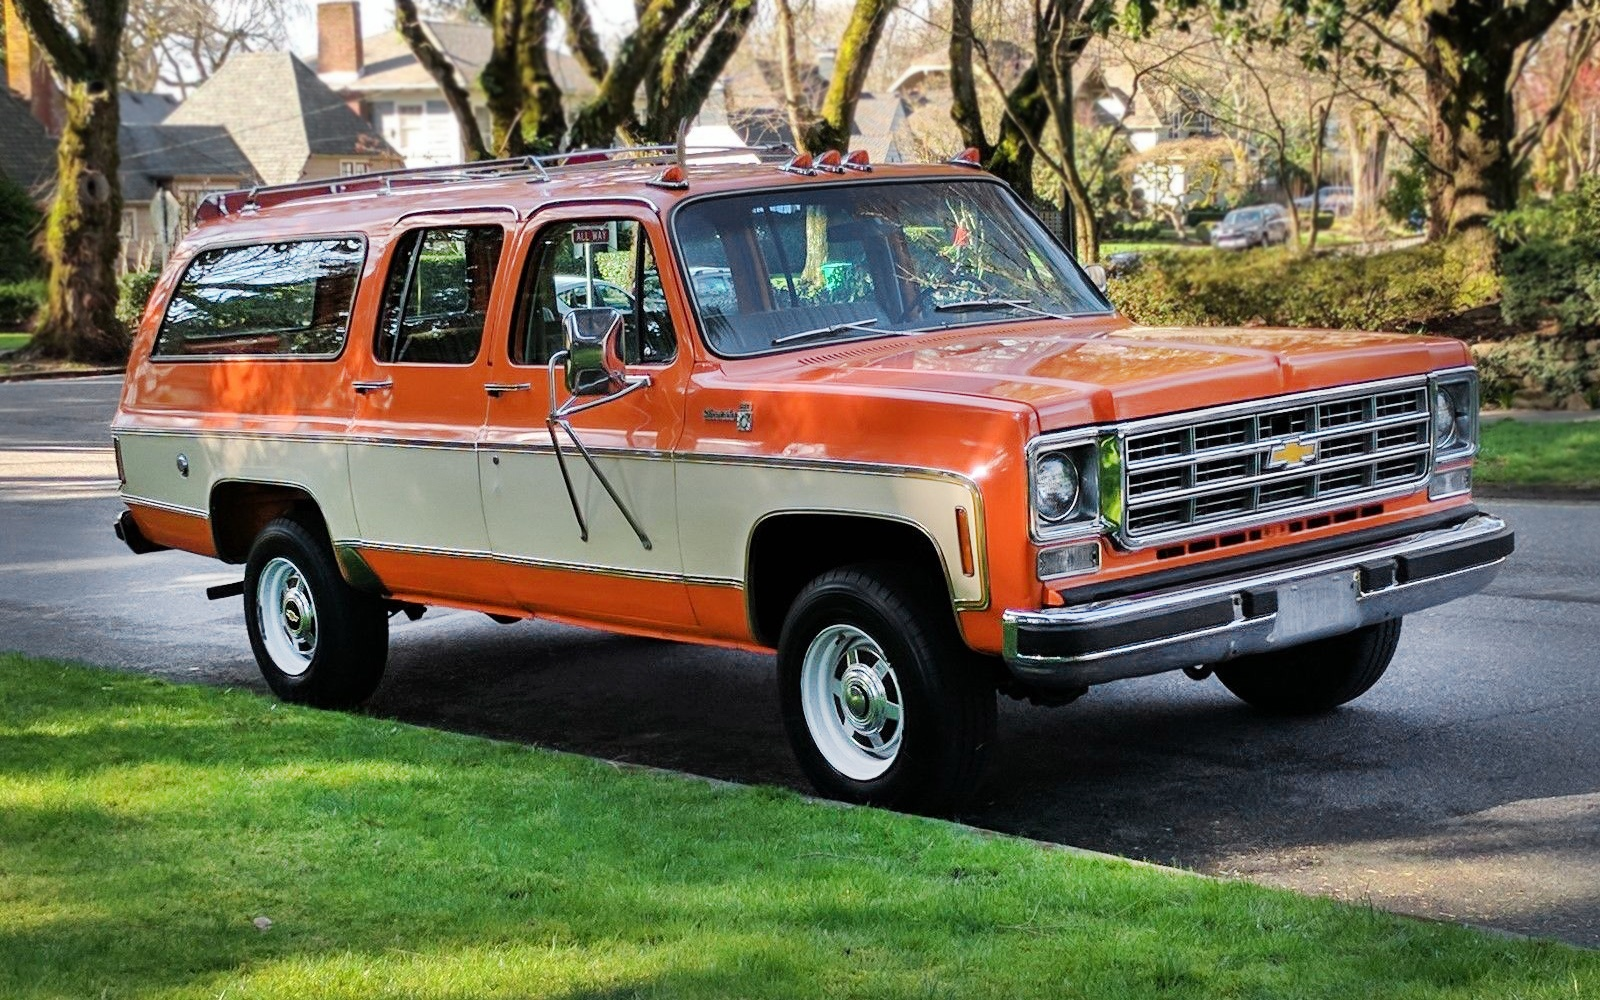 Avis Car Rental NJ  Avis Truck Rental  Avis NJ